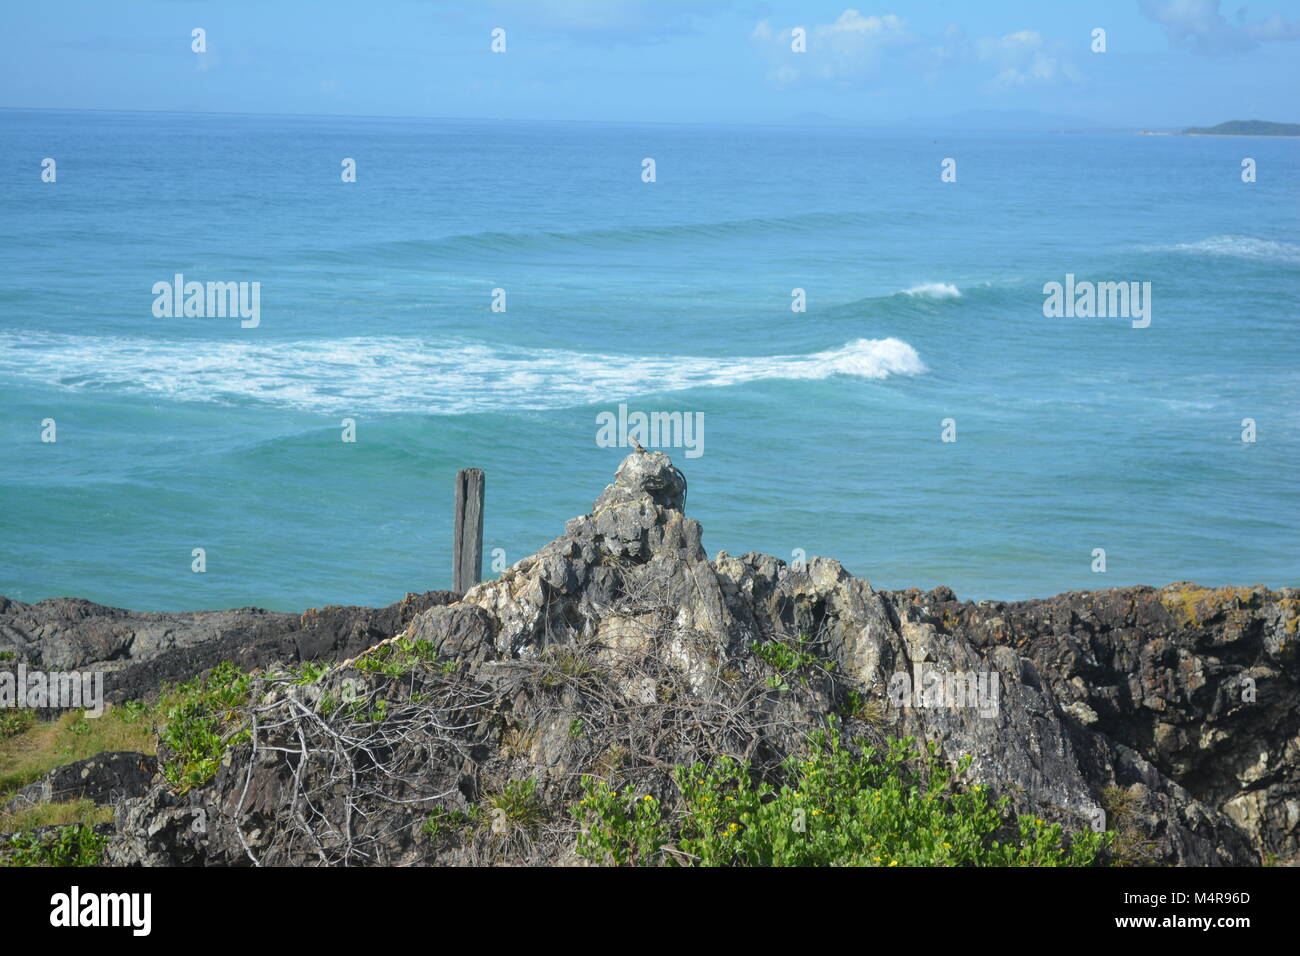 7f4d0eabaf1 Lizard sunbaking on the rocks looking over Pacific Ocean